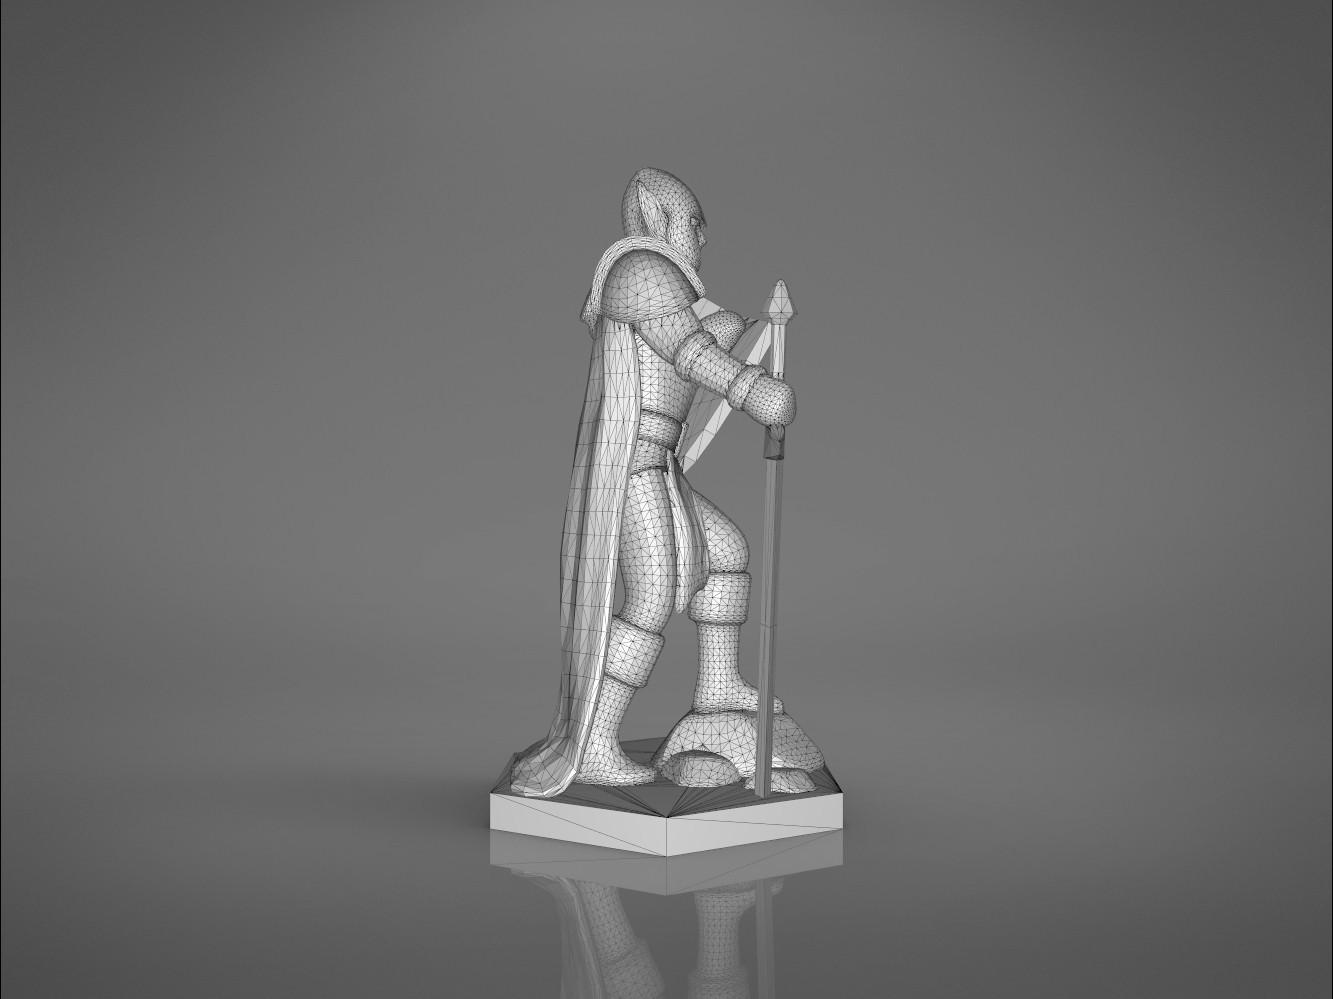 Warrior-left_perspective.371.jpg Download STL file ELF WARRIOR CHARACTER GAME FIGURE 3D print model • Object to 3D print, 3D-mon